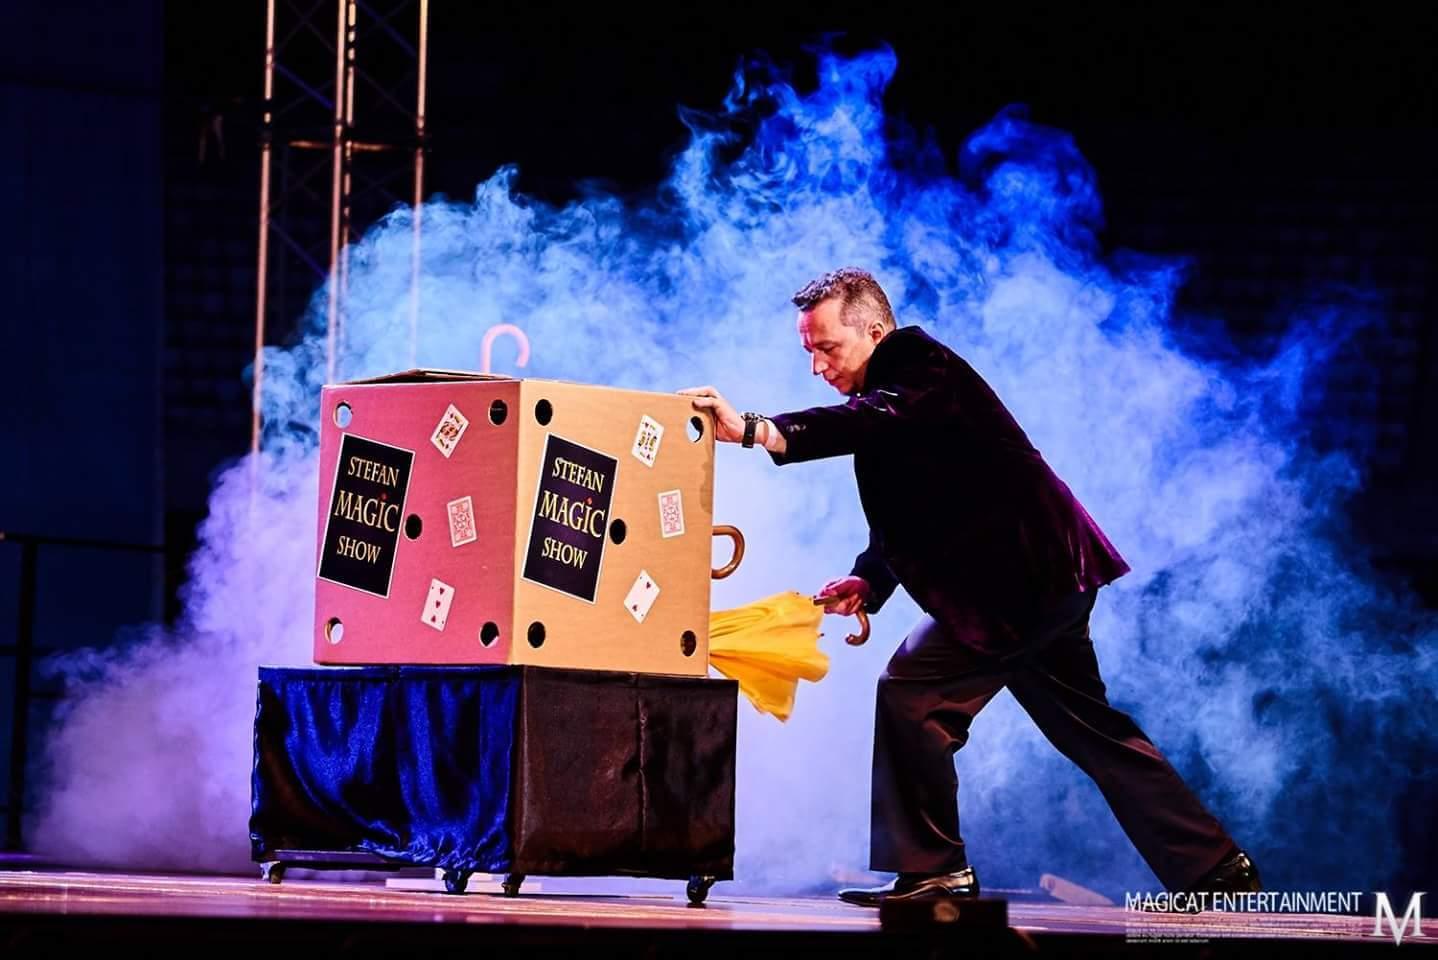 stefan magic show magician cluj petreceri copii (5)